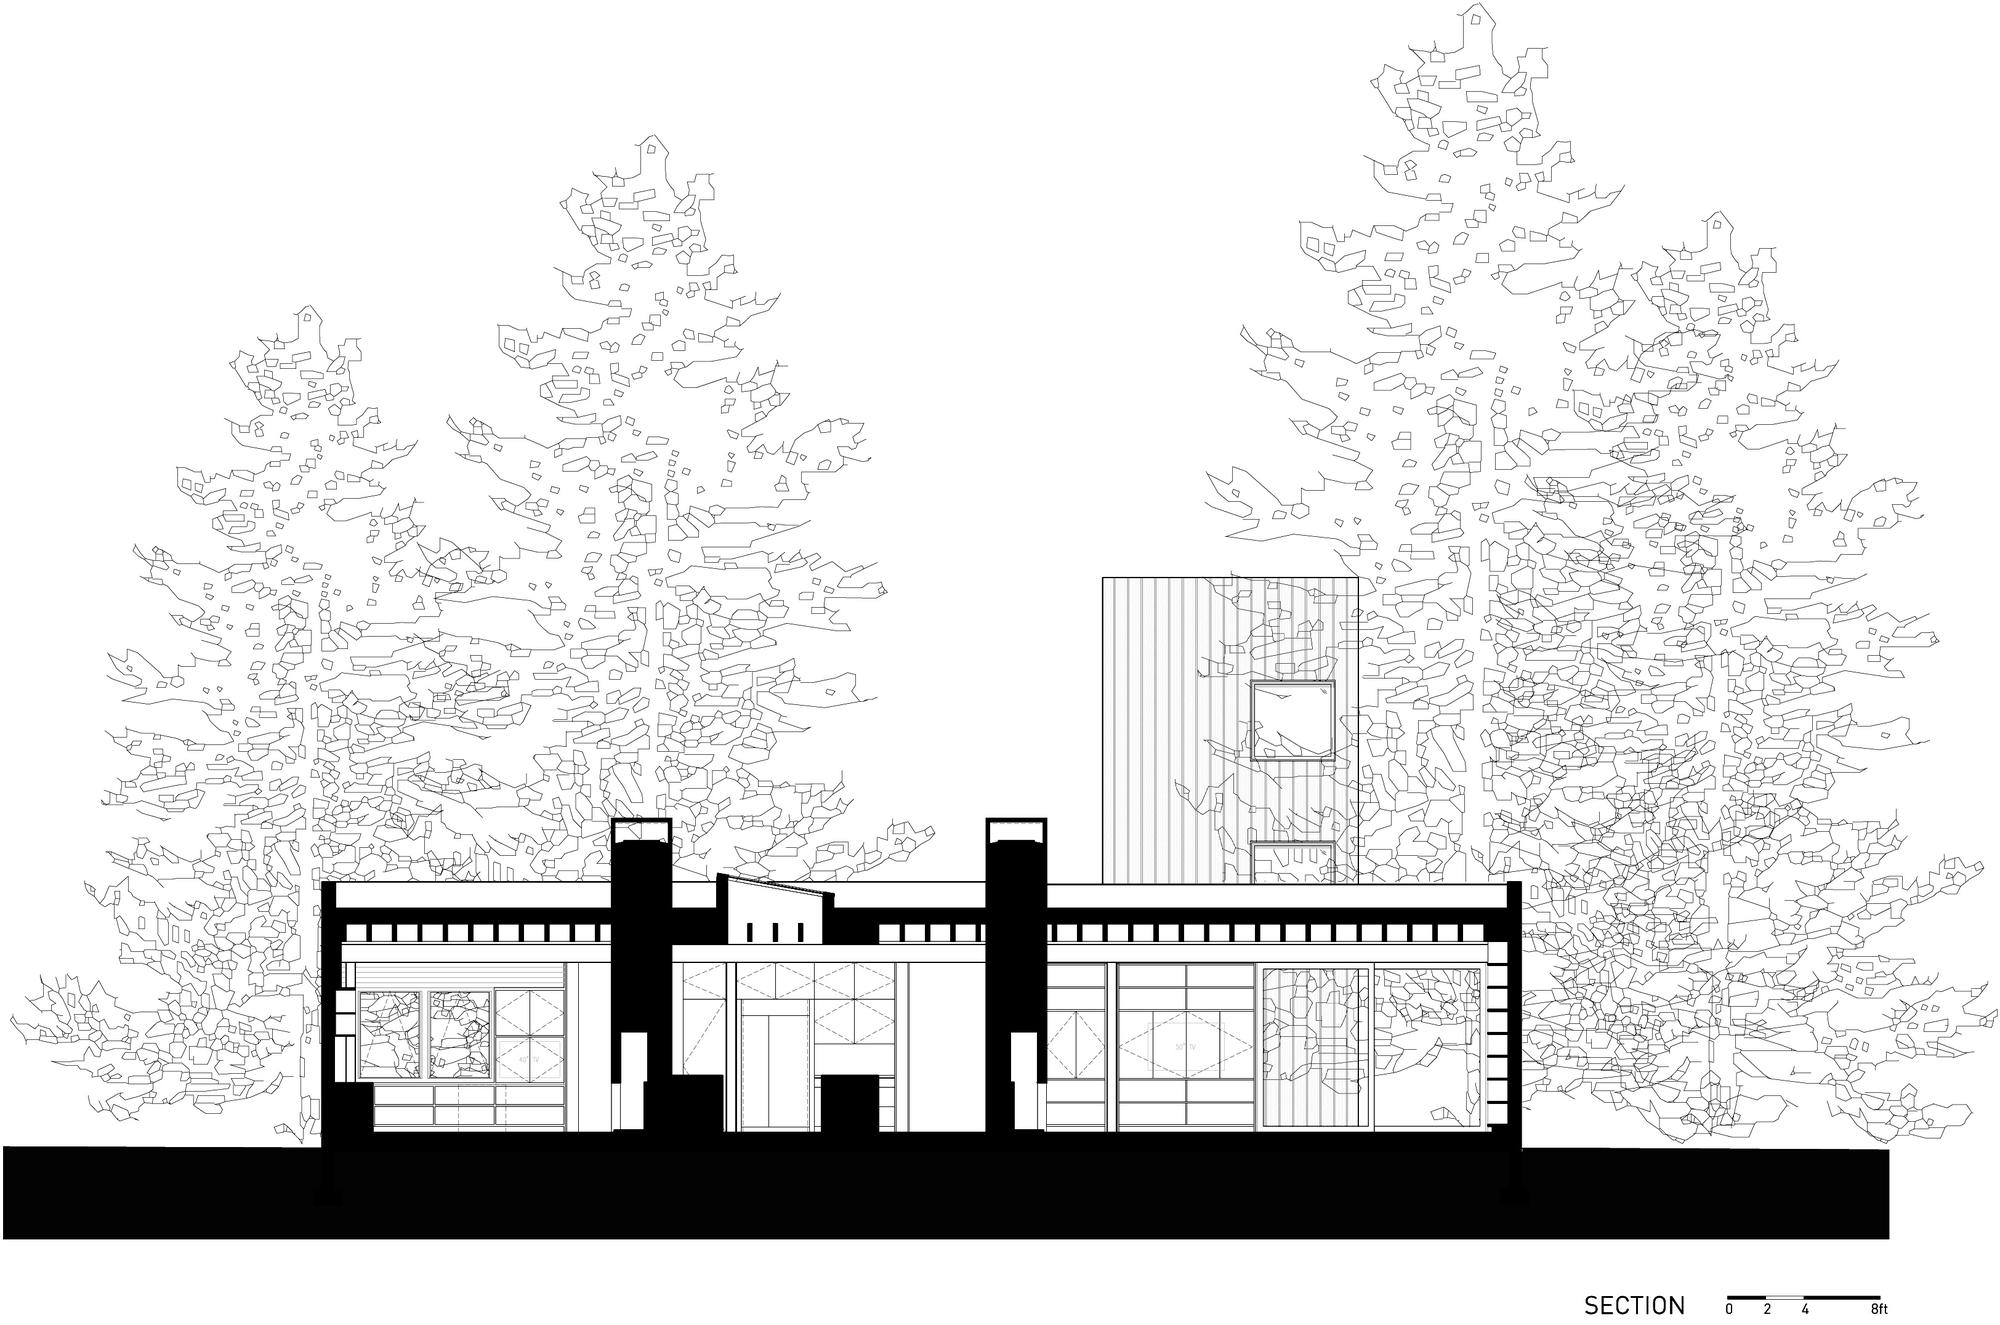 533cdf11c07a804c1b00005d_low-rise-house-spiegel-aihara-workshop_lowrise_section-short_copia